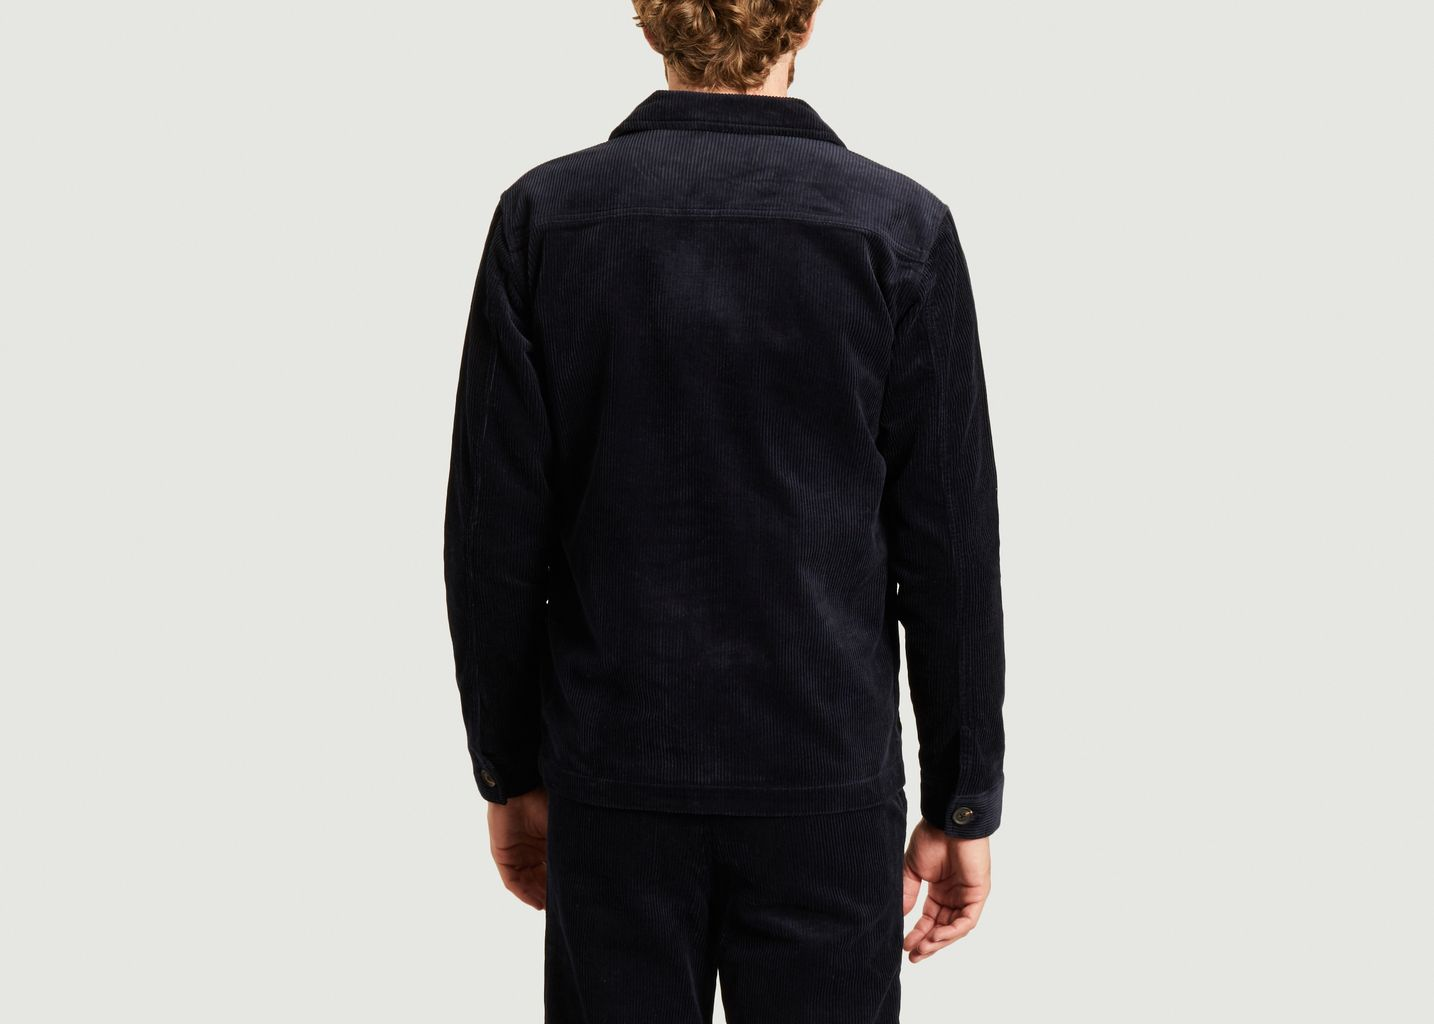 Veste zippée Matt - SUIT